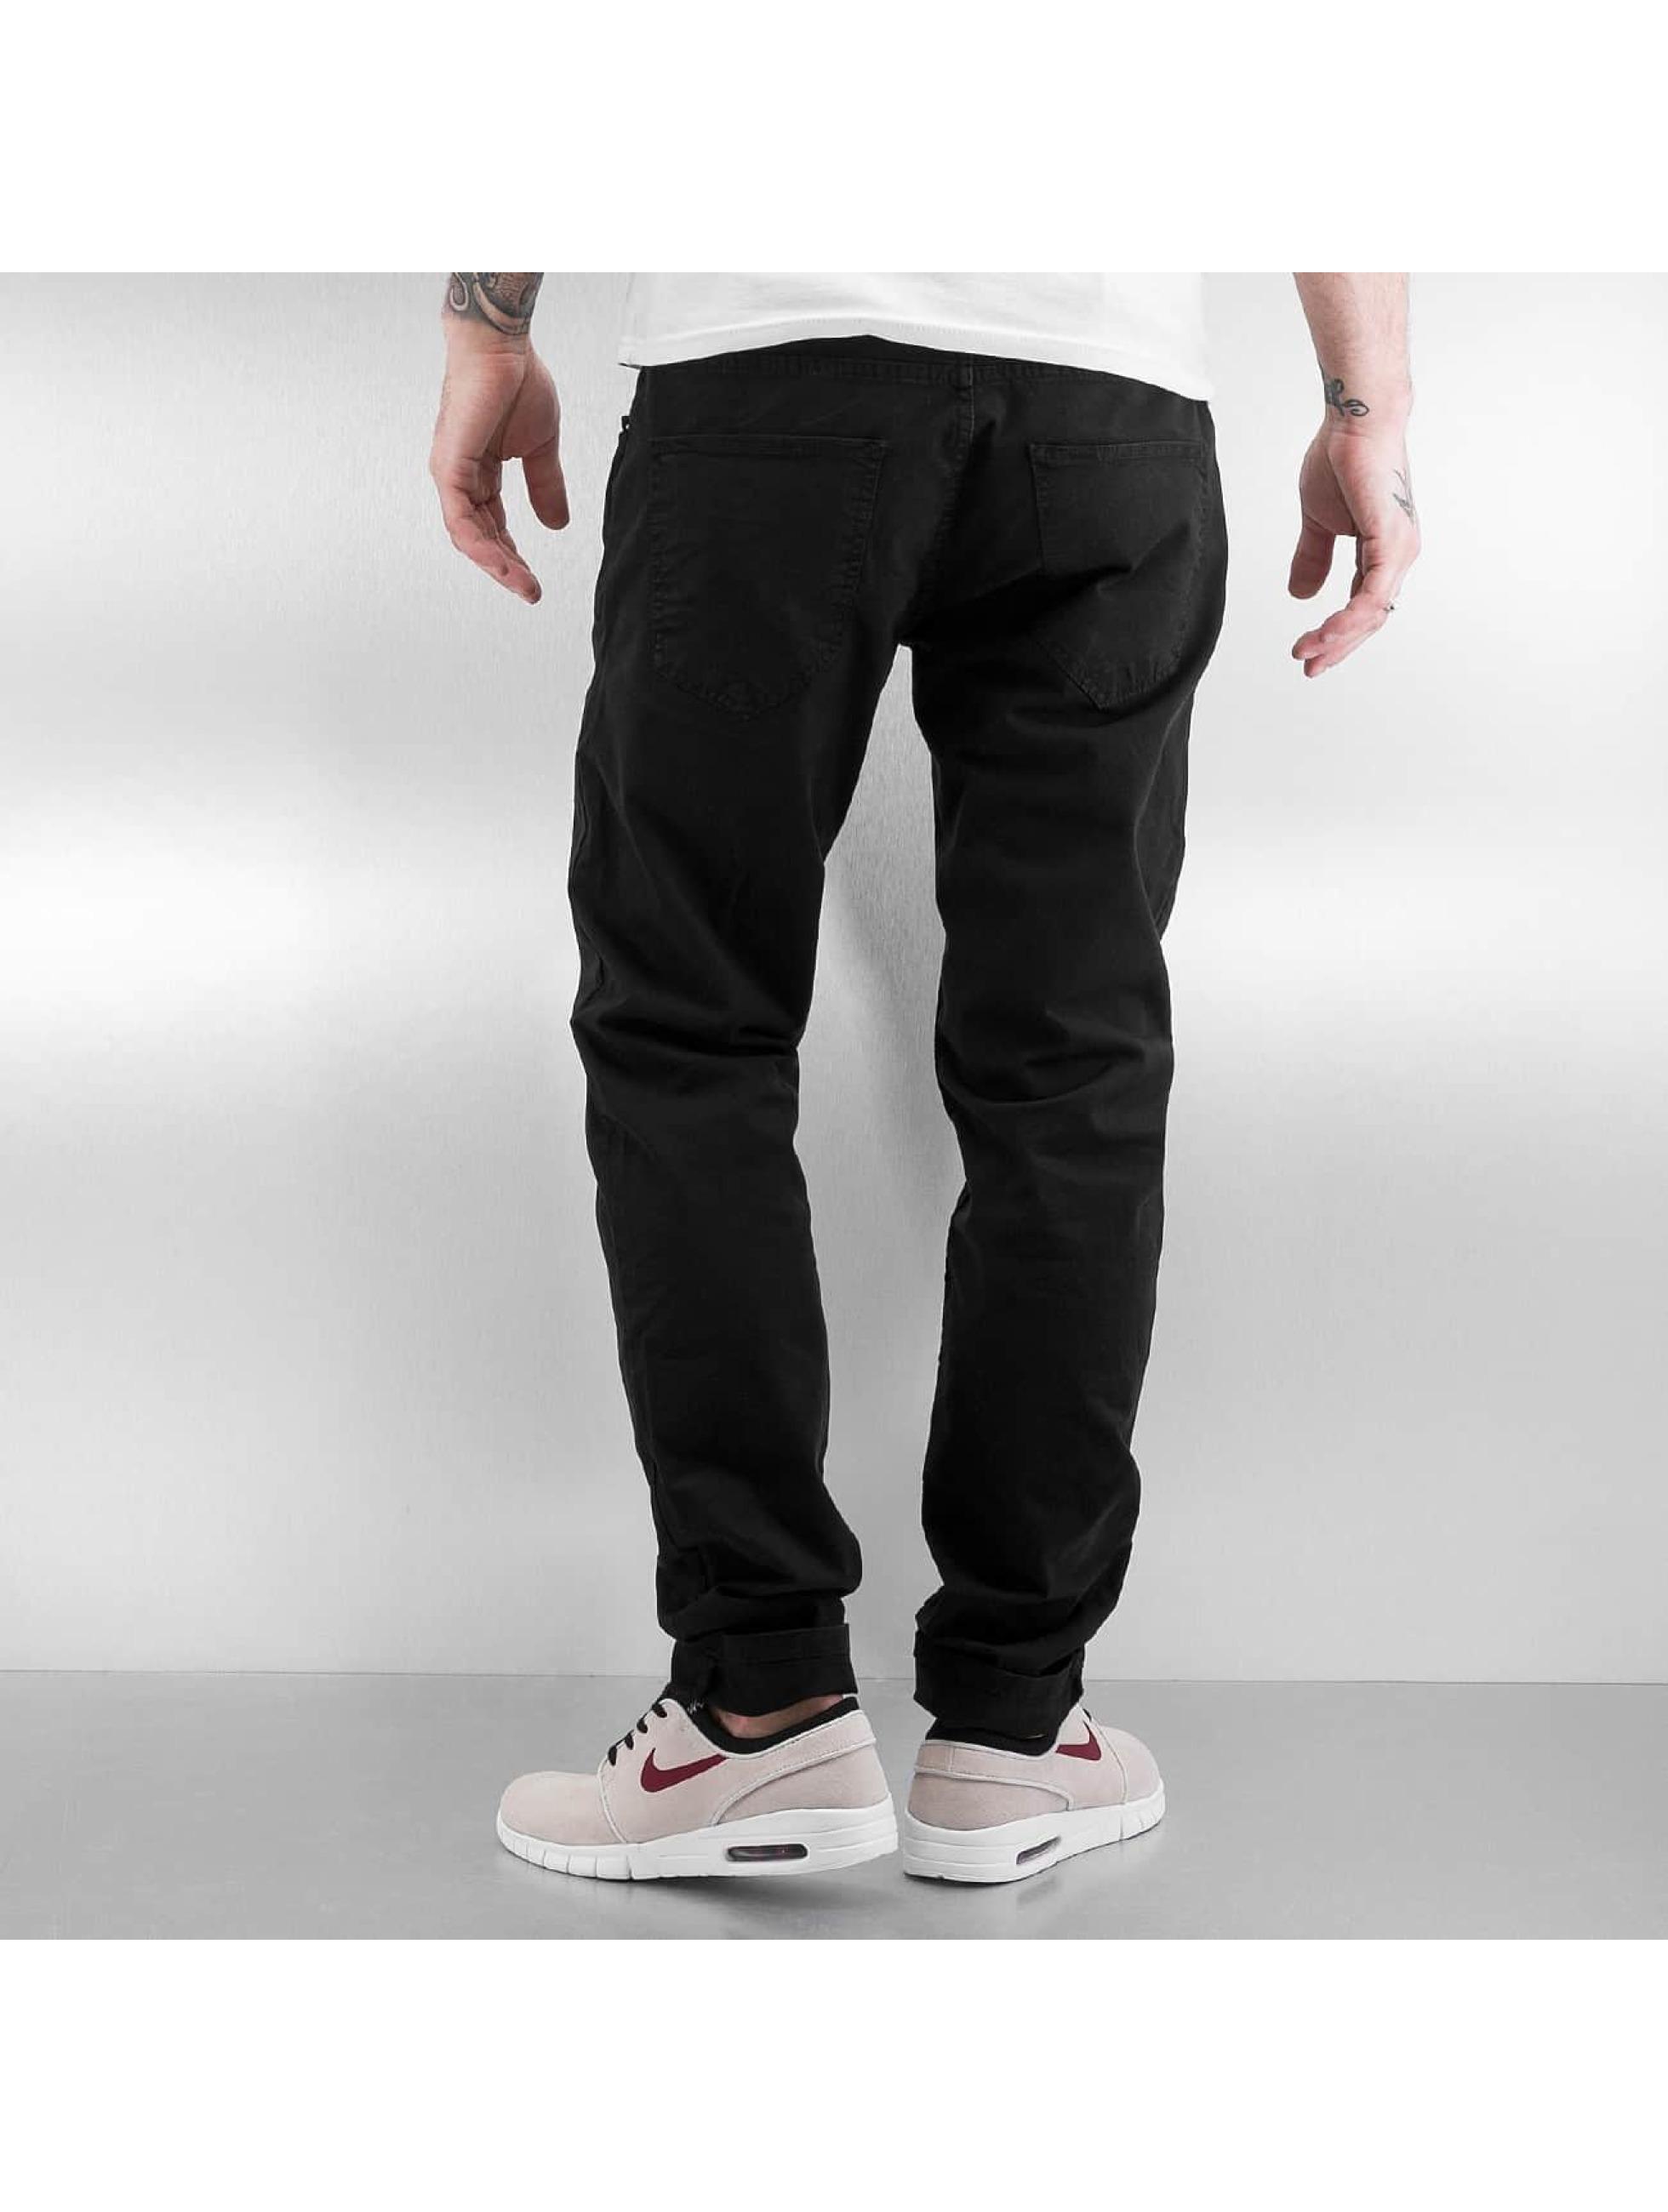 def basic noir homme pantalon chino def acheter pas cher pantalon 301153. Black Bedroom Furniture Sets. Home Design Ideas